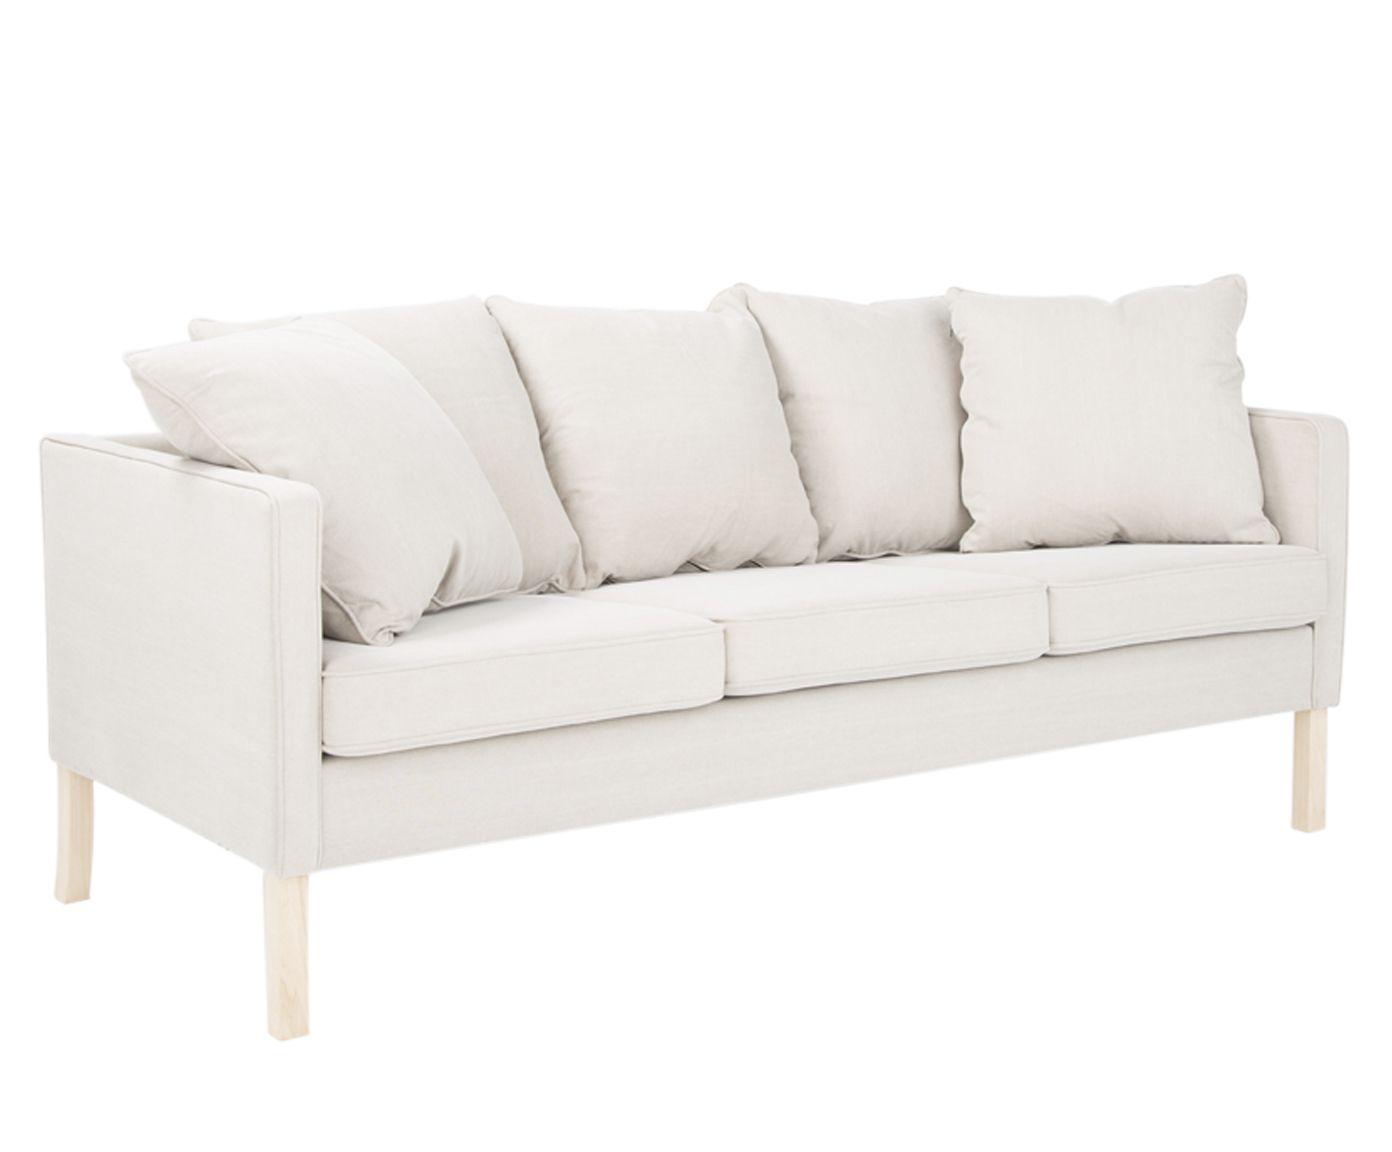 Sofabett holz  Sofa CUDDLE - Holz, Textil WestwingNow | WestwingNow | Future ...